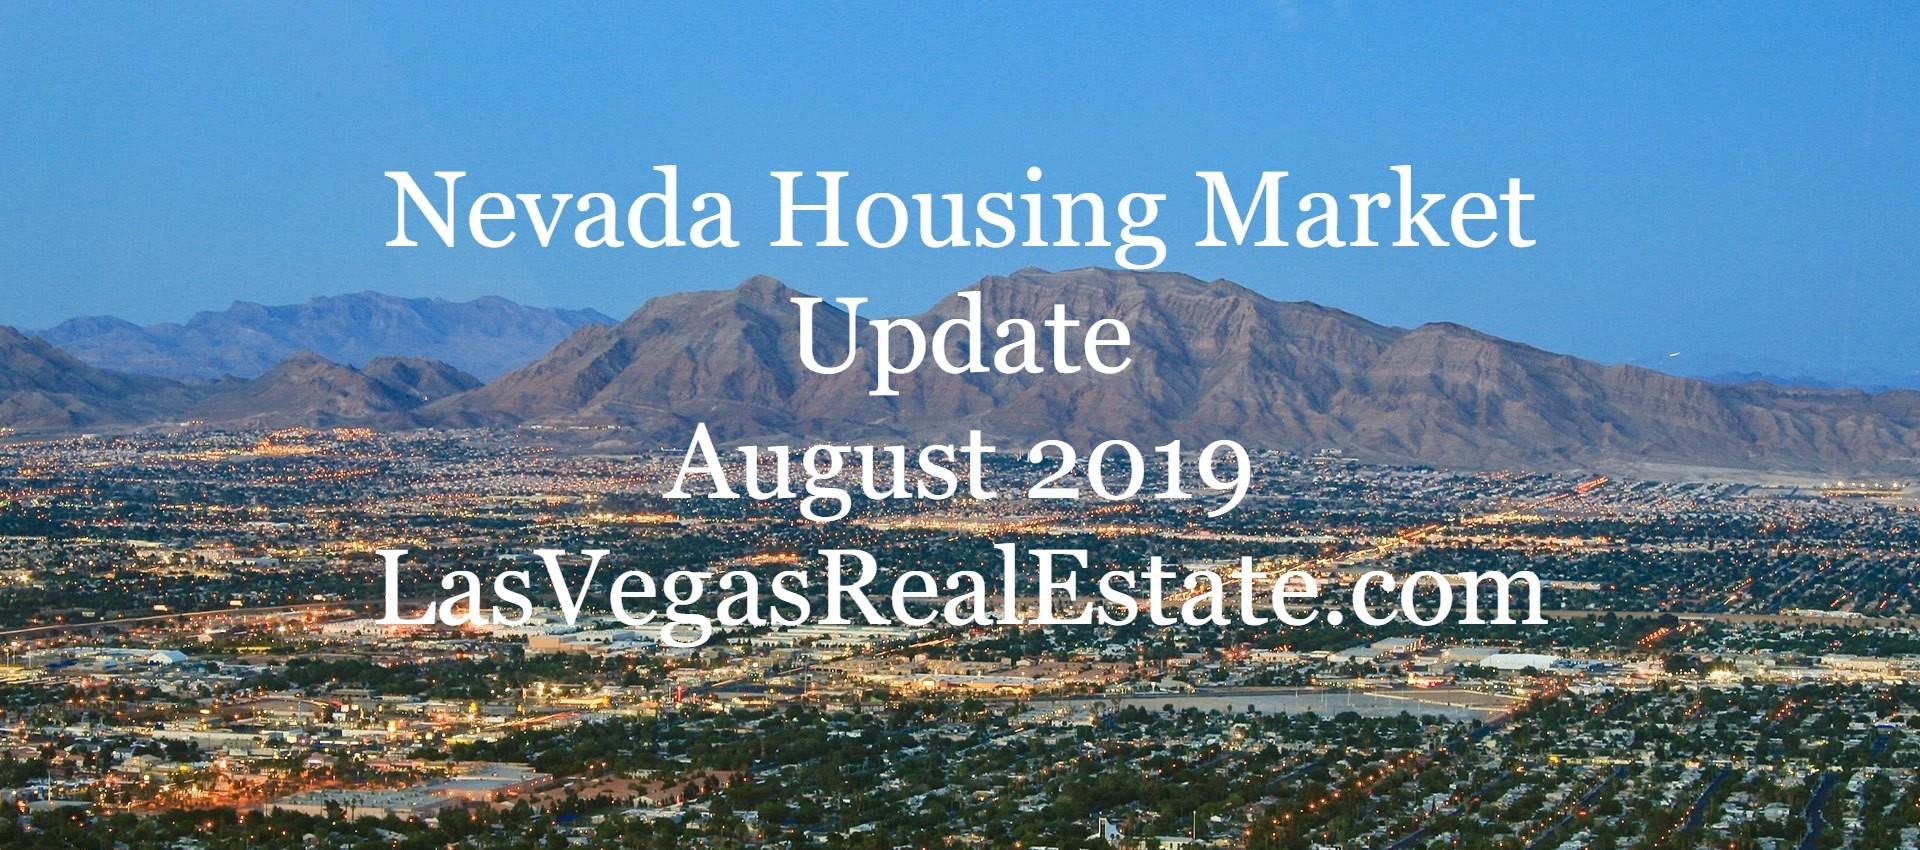 Nevada Housing Market Update 2 - August 2019 - LasVegasRealEstate.com